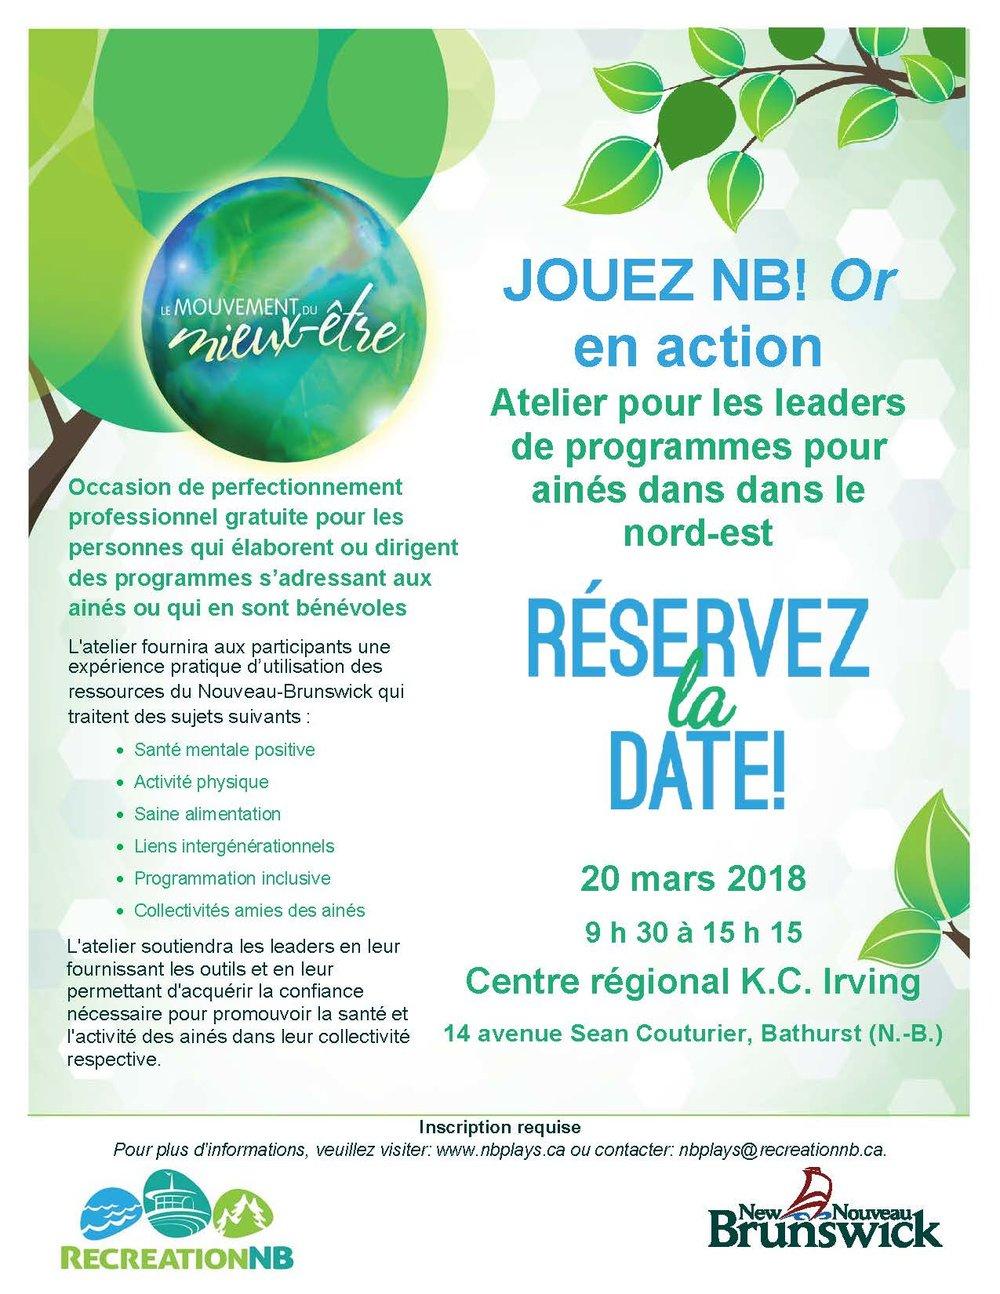 Reservez-la-date-Or BATHURST.jpg